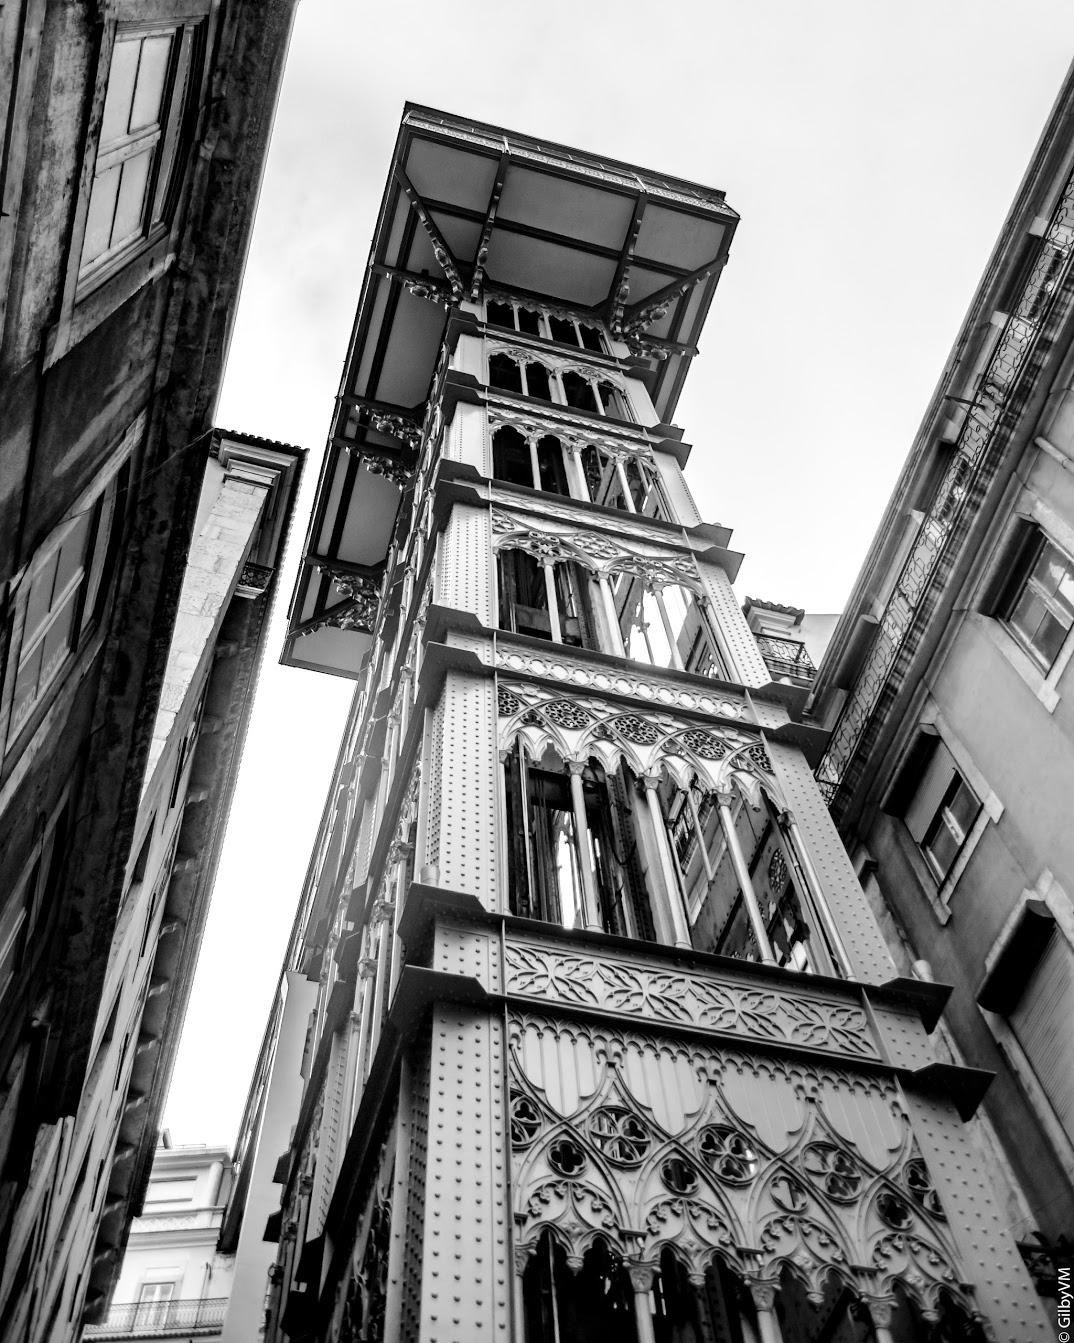 streetphotos, streetphotography - gilbyvm   ello